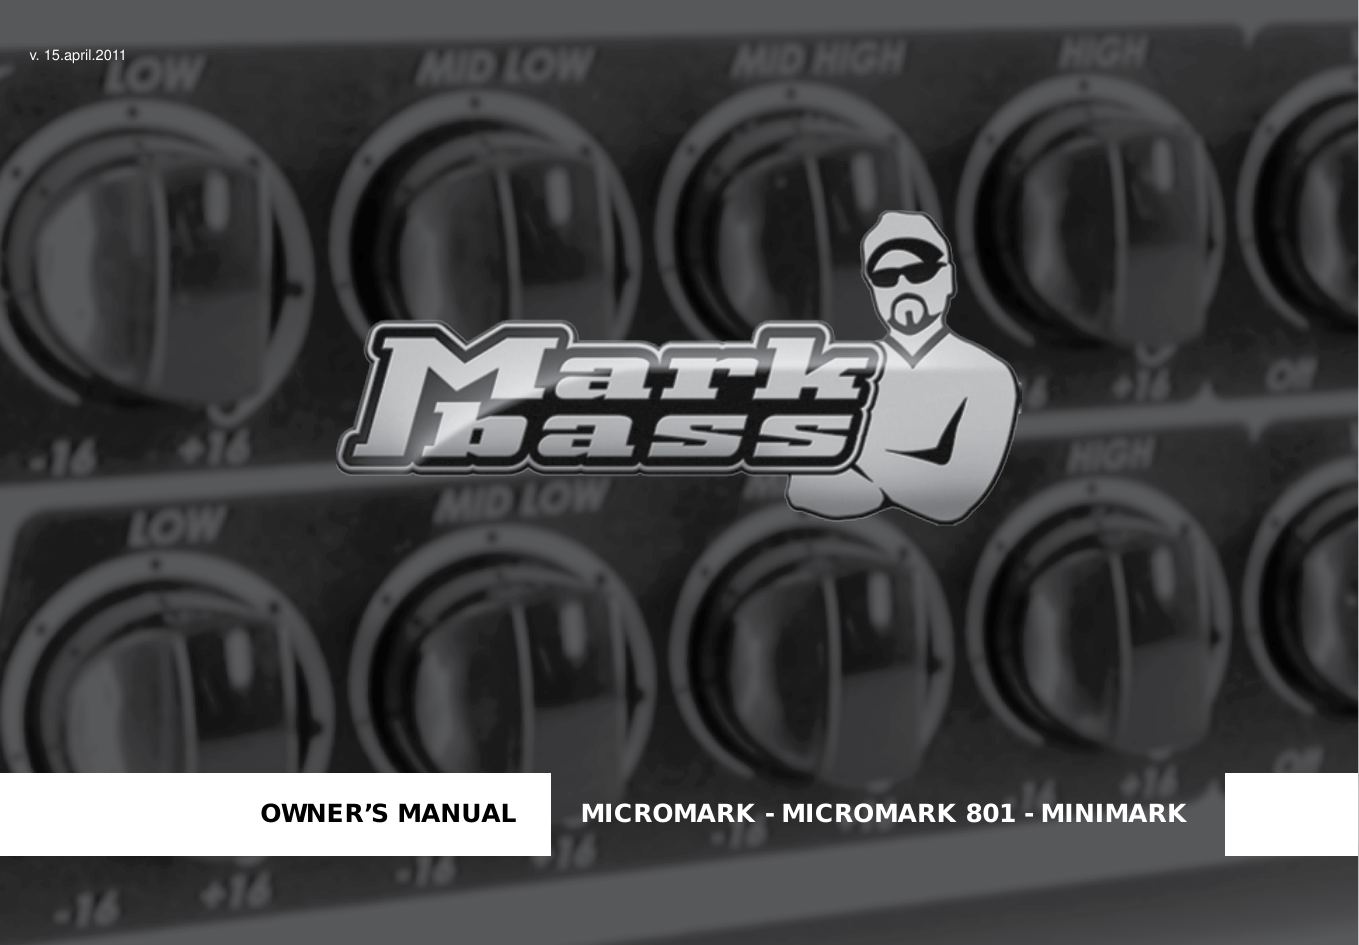 Markbass Minimark Owners Manual Avan Av 801 Headset Headphone Page 1 Of 12